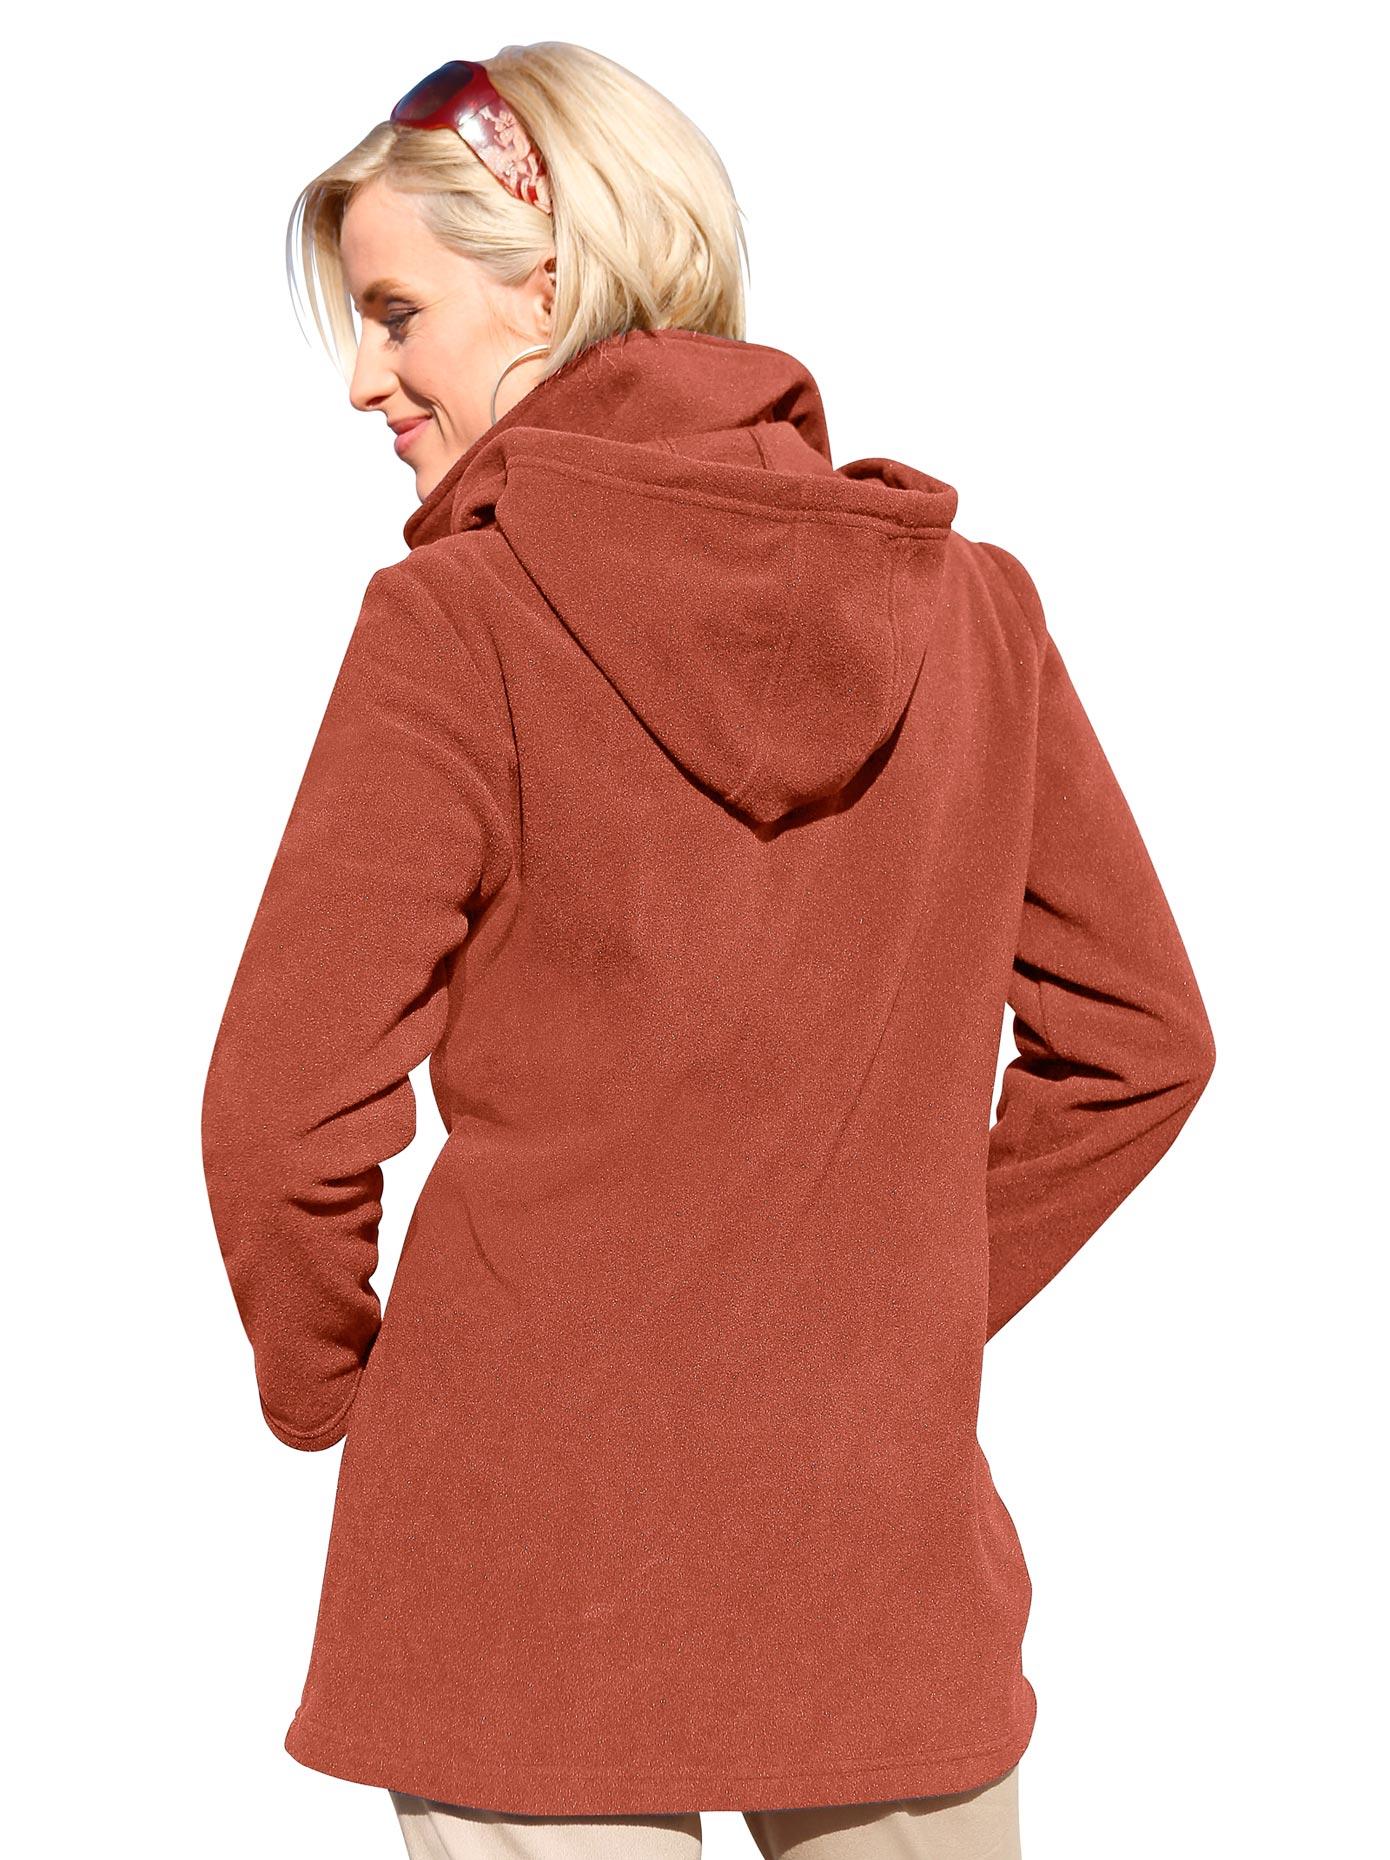 Casual Looks Fleece-Jacke mit Kordelstopper   Bekleidung > Jacken > Fleecejacken   Casual Looks